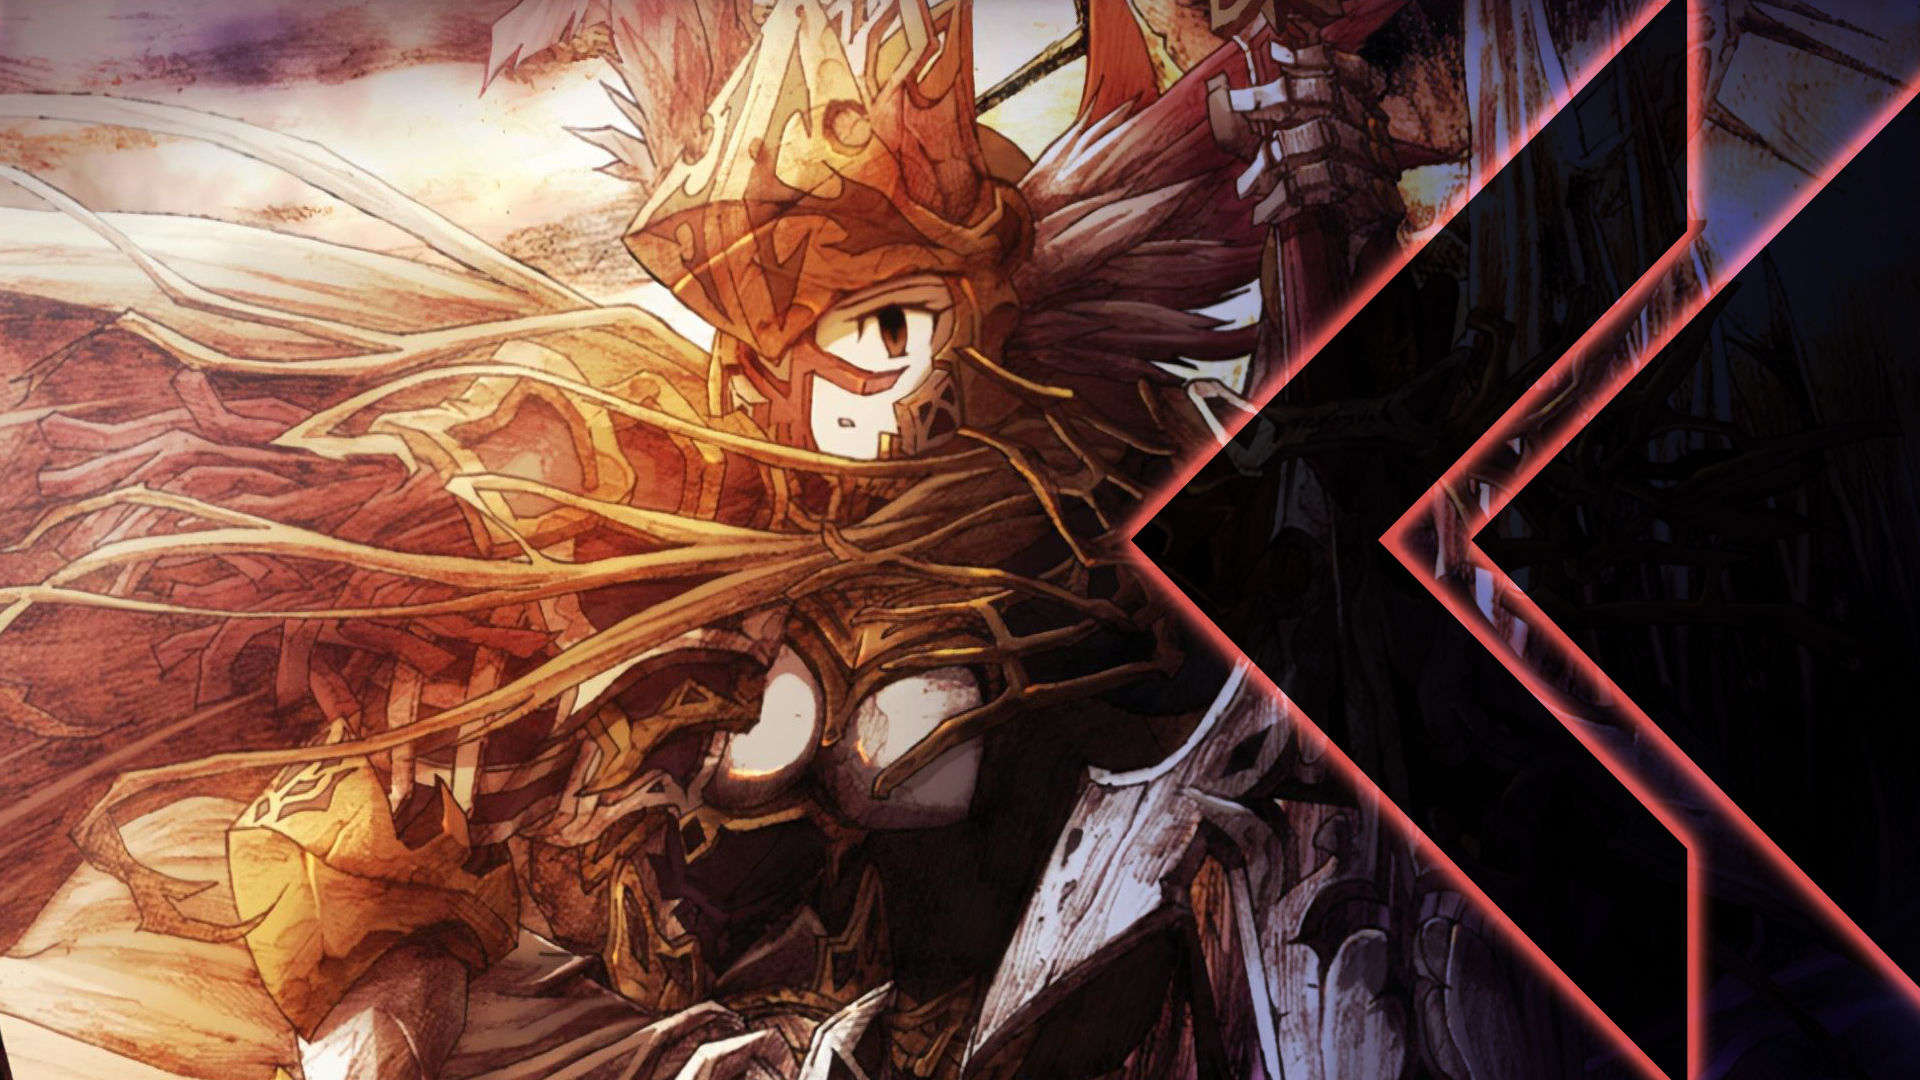 Retro Encounter 292 Knights in the Nightmare